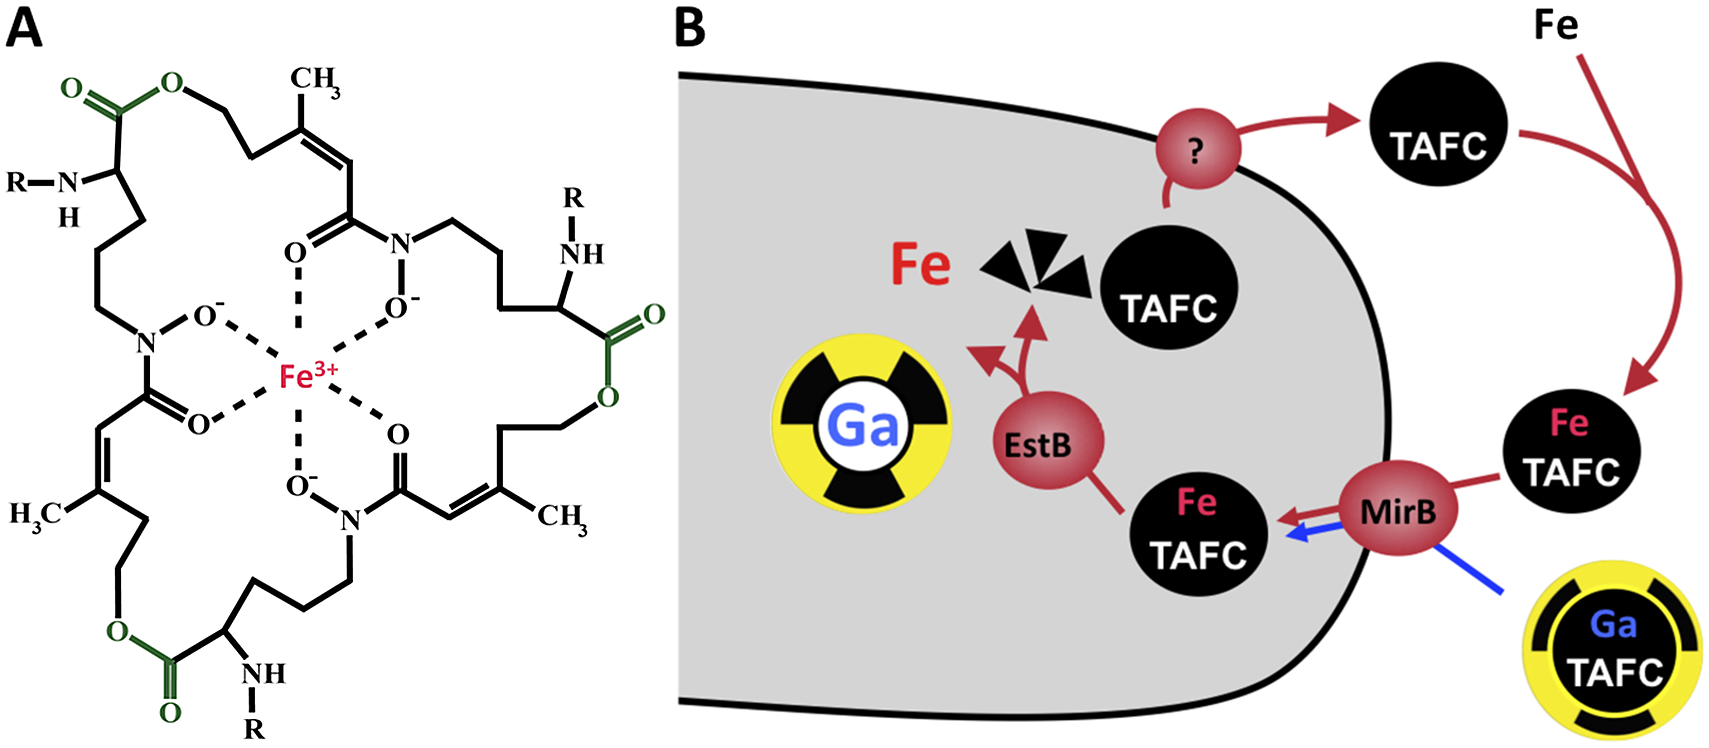 Siderophore mediated-iron uptake in <i>A. fumigatus</i>.